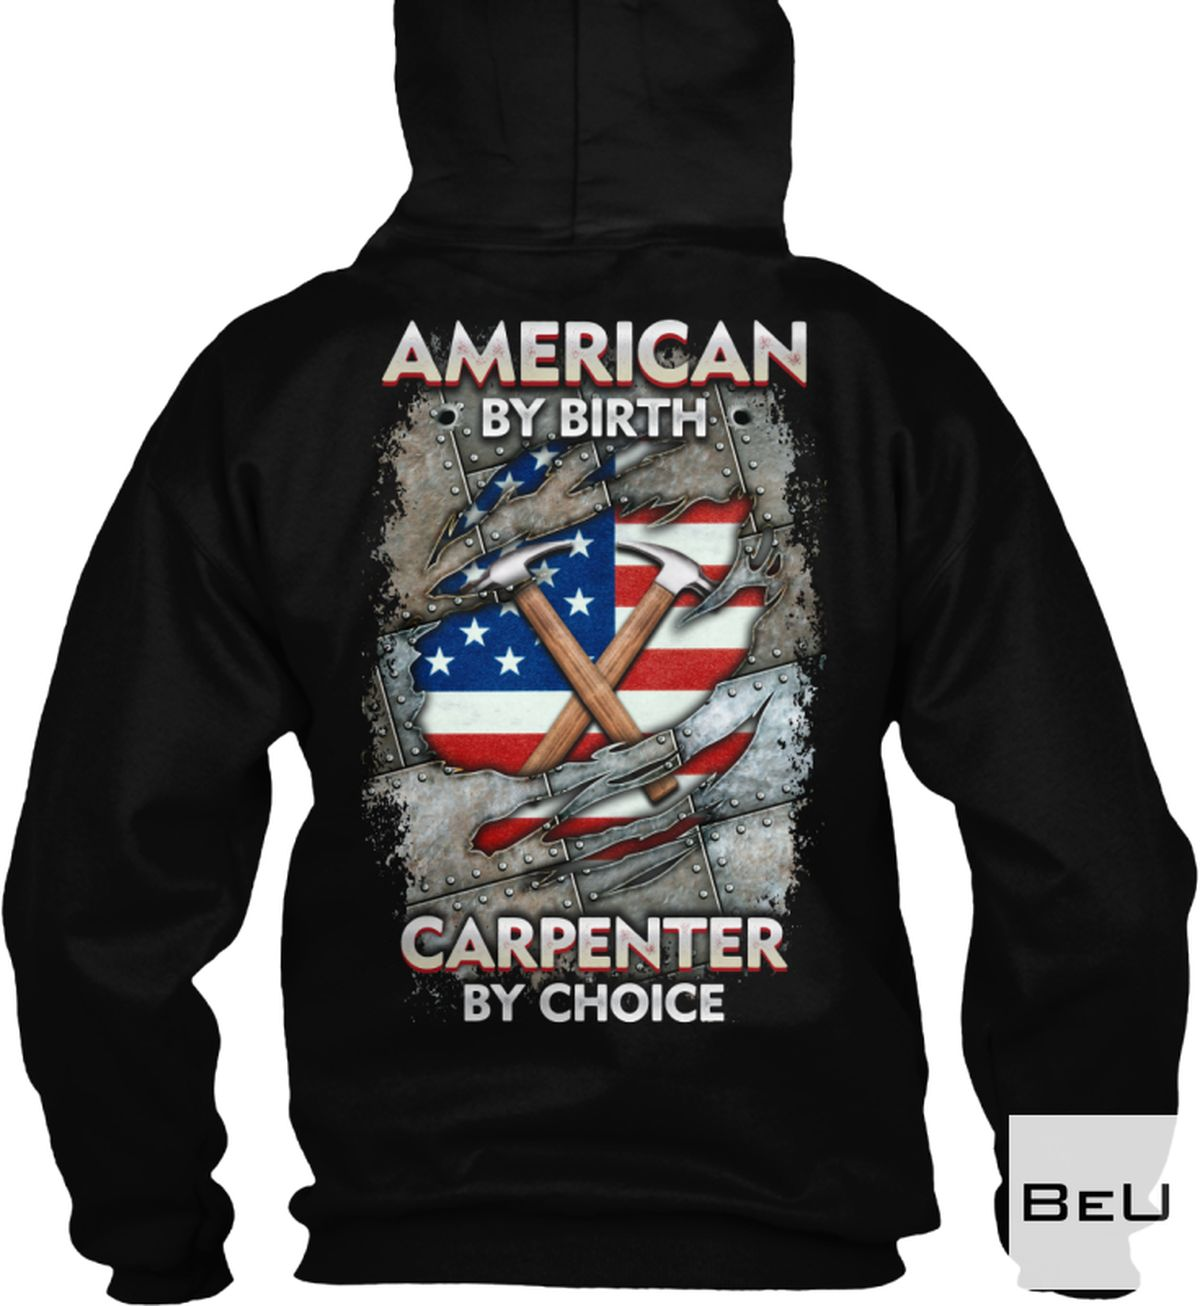 American By Birth Carpenter By Choice Shirt, hoodie